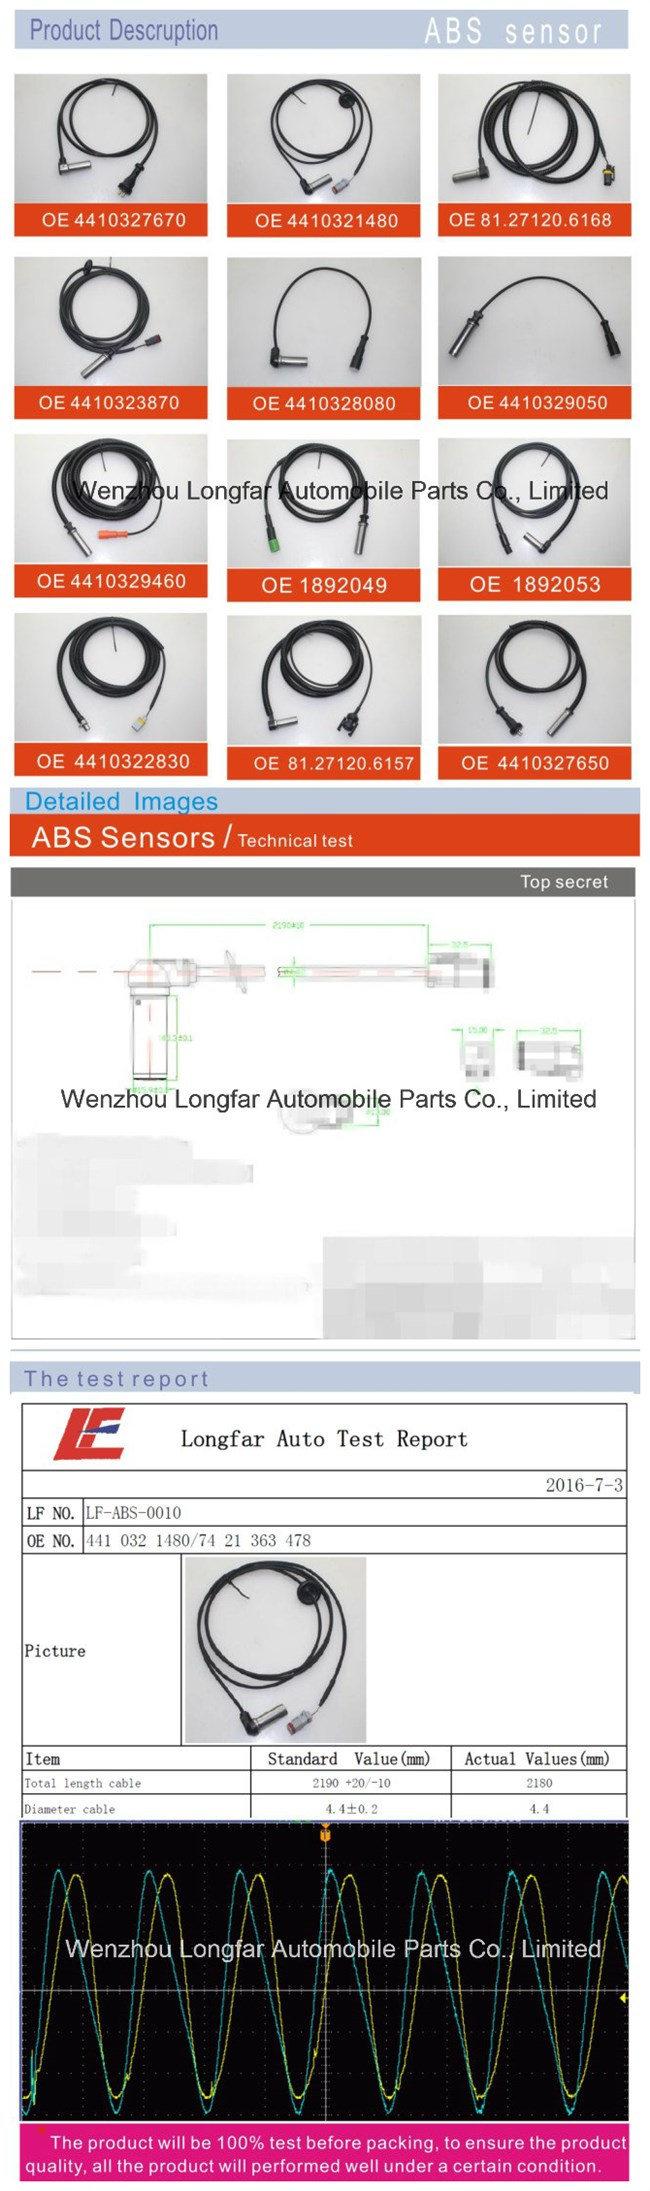 Truck Auto ABS Sensor Anti-Lock Braking System Transducer Indicator Sensor 4410328790, 5.20147, 14-34 533 0001, 4029106400, 45779 for Mecedes-Benz,Daf,Dt,Meyle